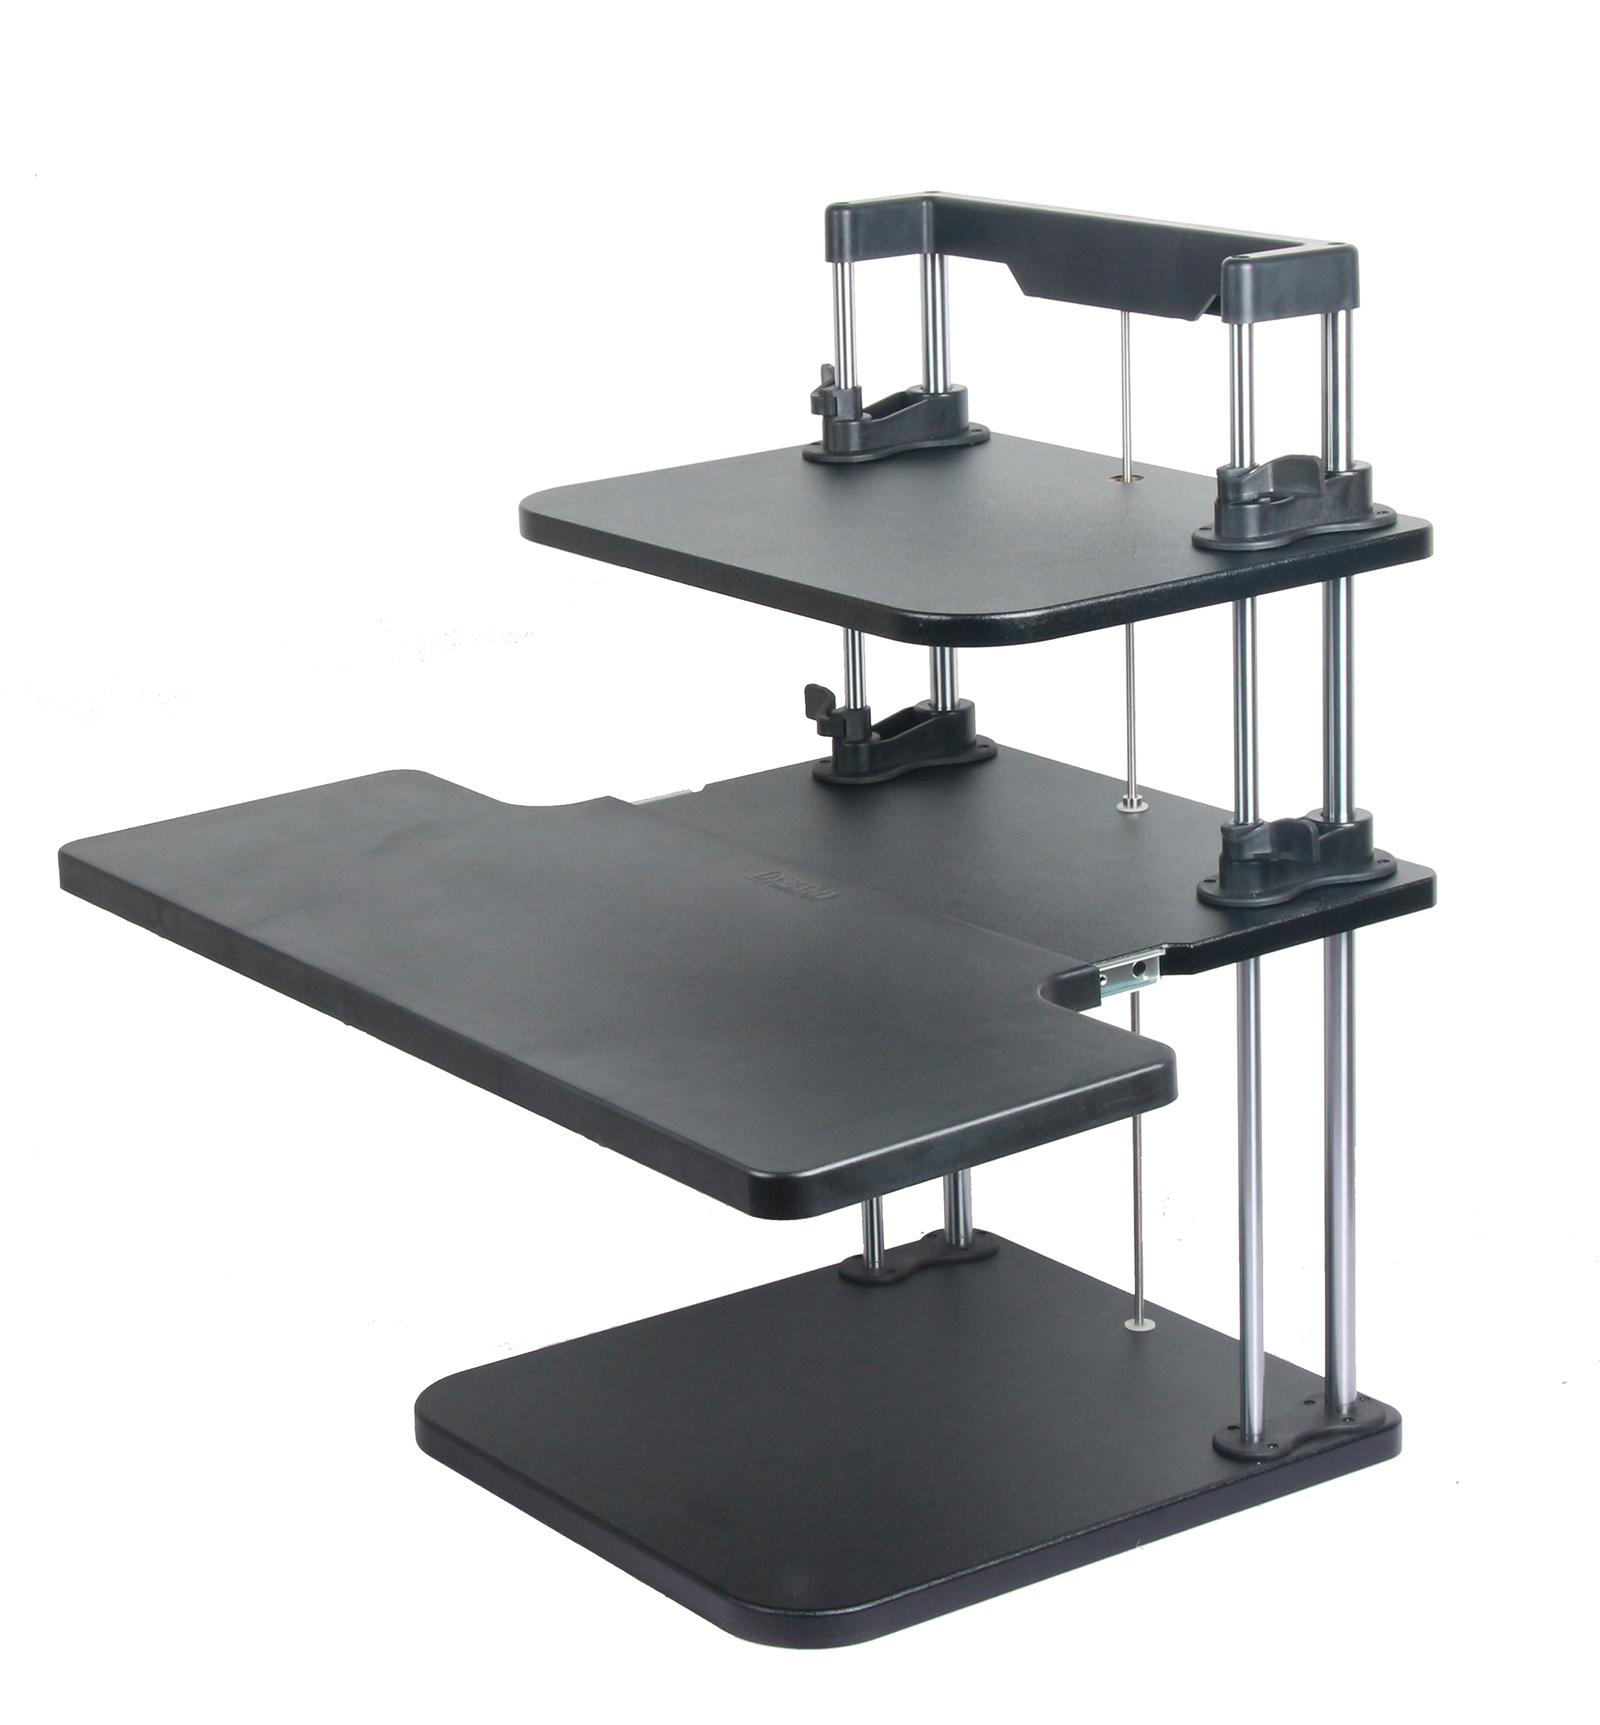 Ergonomic Height Wide Adjustable Computer Sit/Stand Desk ...